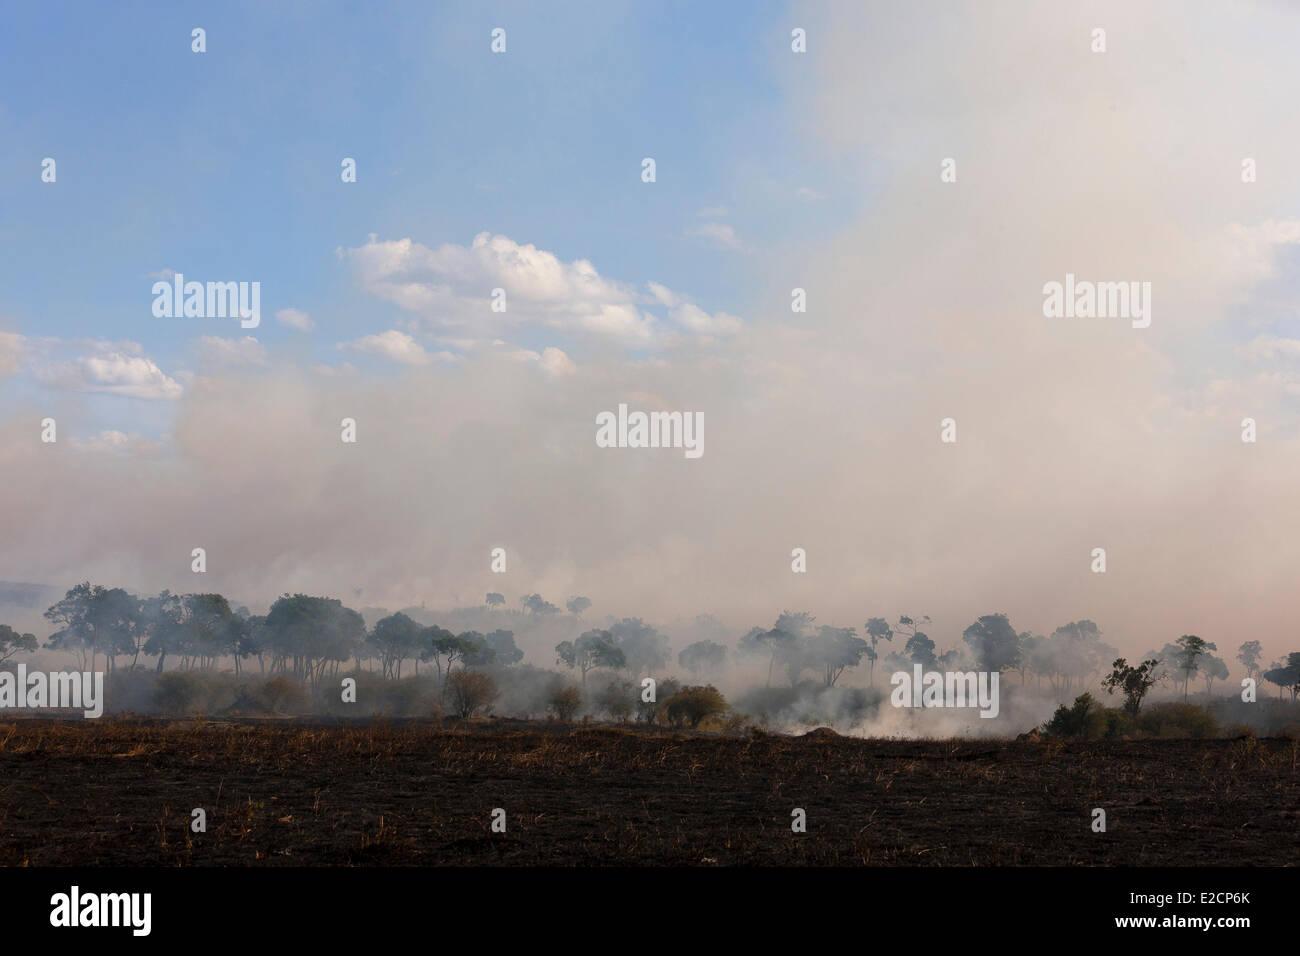 Kenya Masai Mara national reserve bushfire Stock Photo